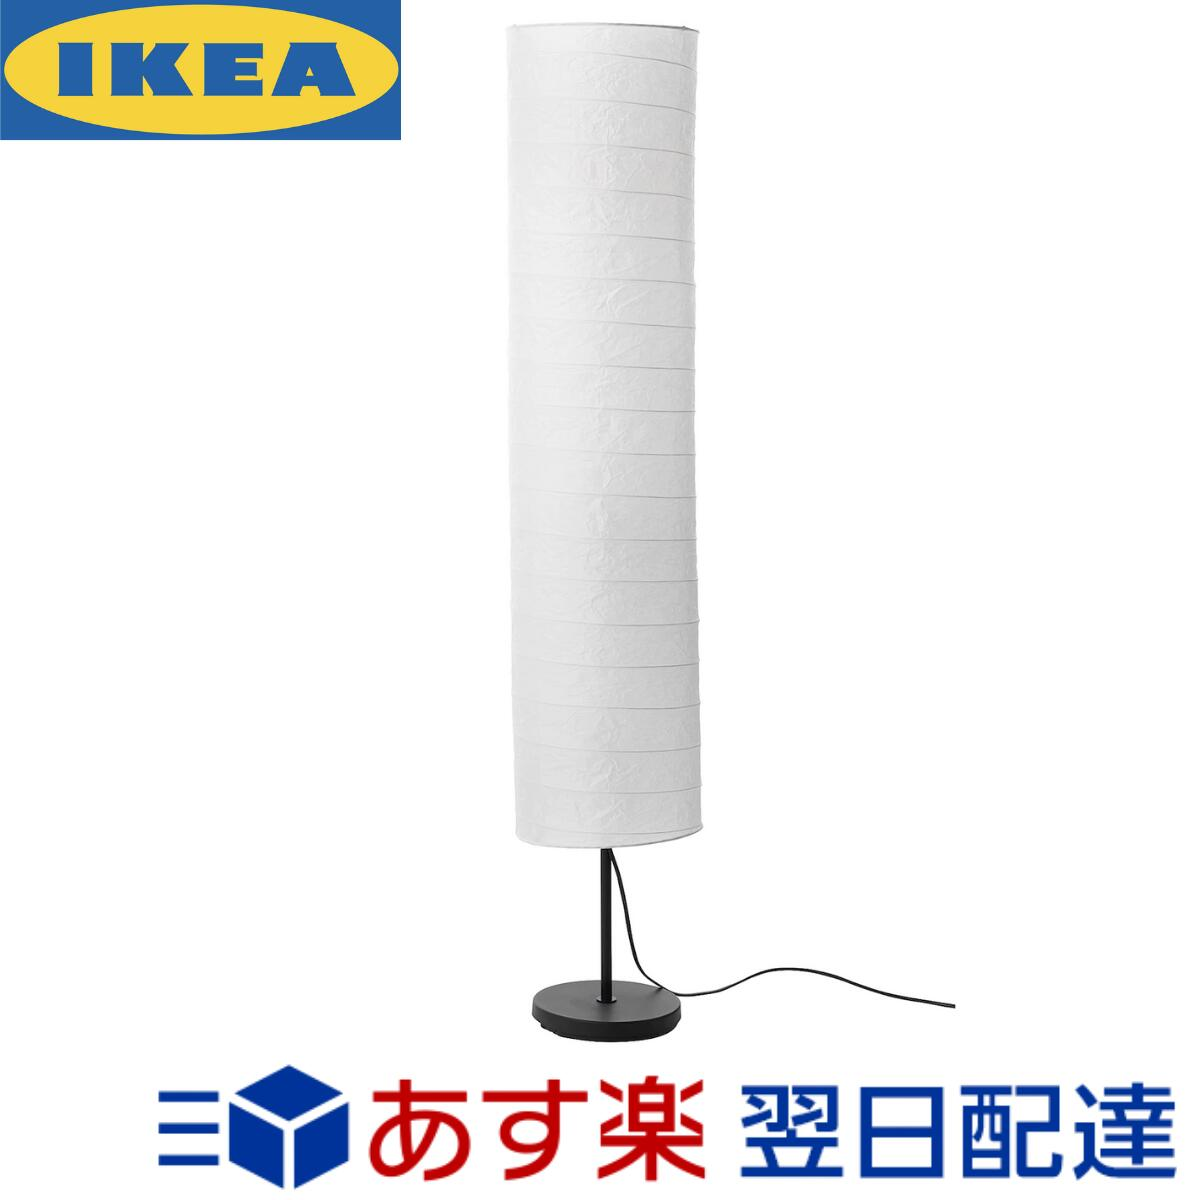 IKEA HOLMO フロアランプ イケア ホルモー フロアライト アッパーライト 照明 フロアスタンド フロアランプ フロアスタンド 間接照明 スタンドライト 床 リビング おしゃれ 寝室 203.941.19